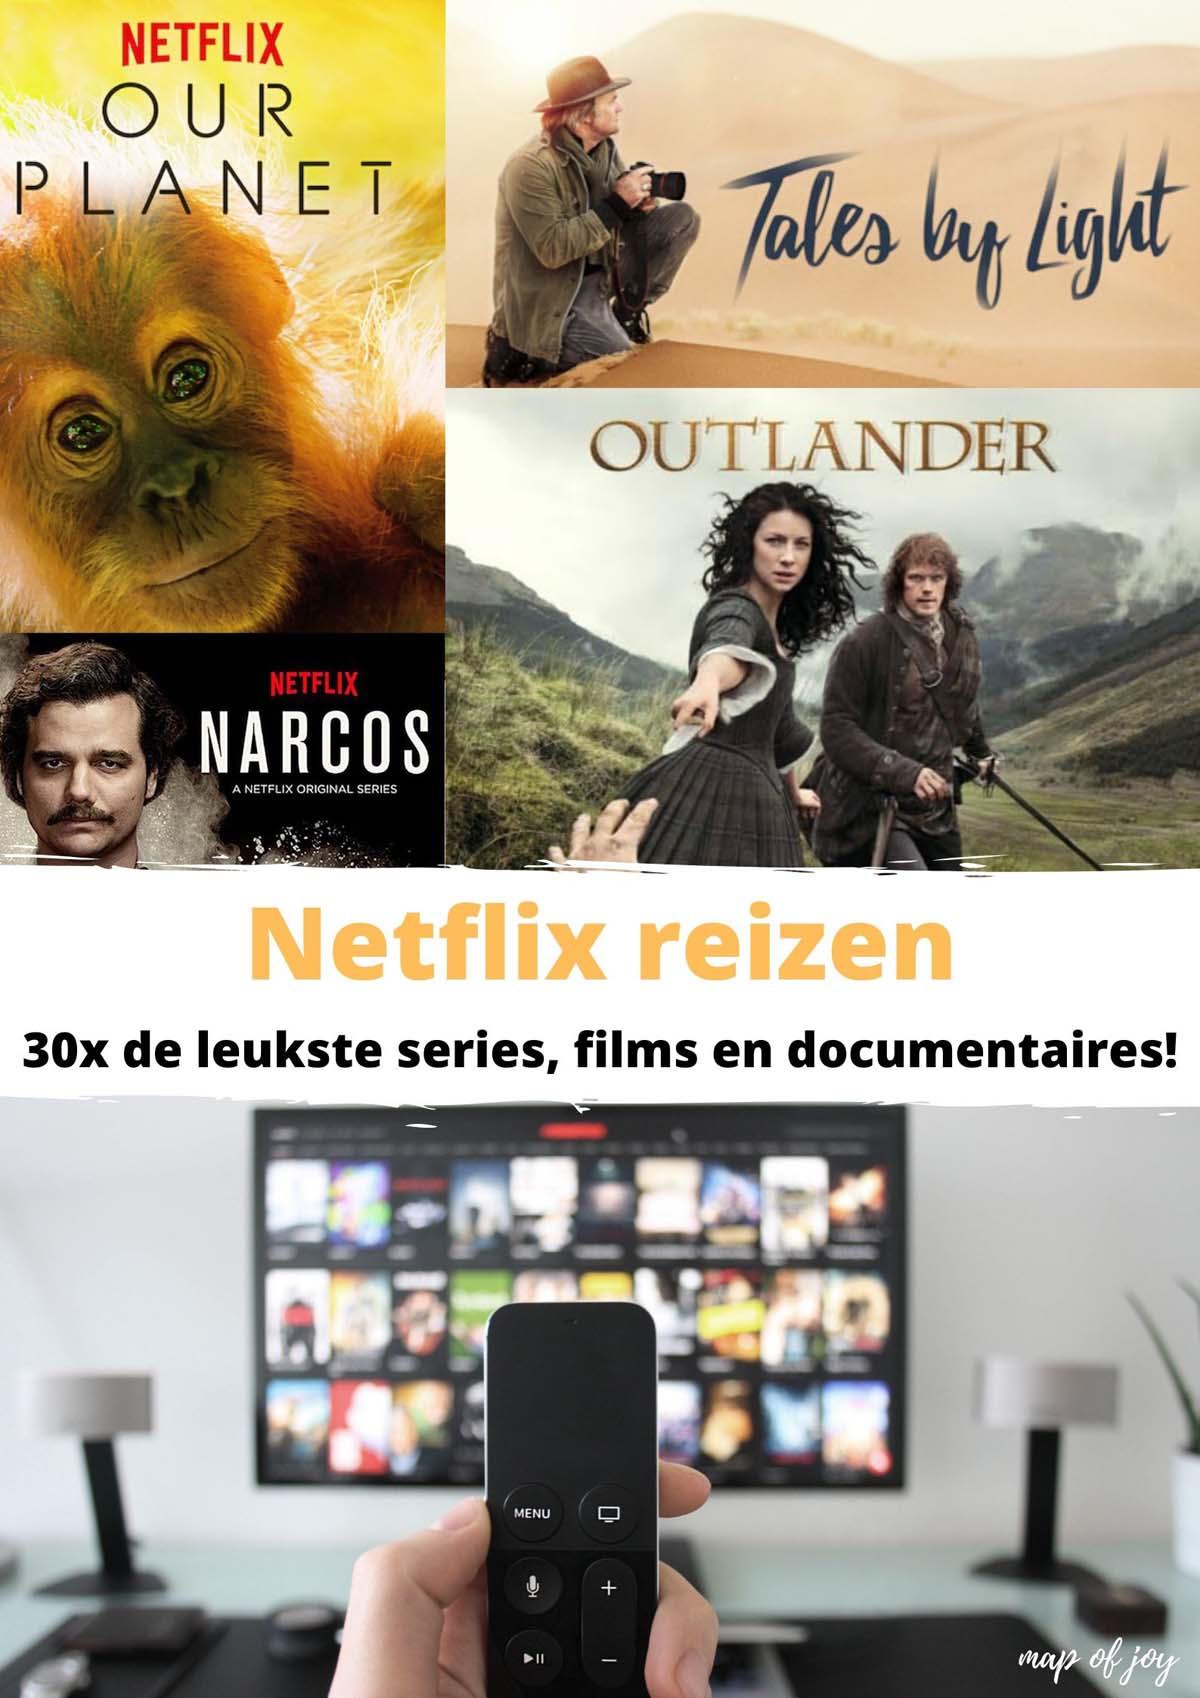 Netflix reizen: 30x de leukste series, films en documentaires!